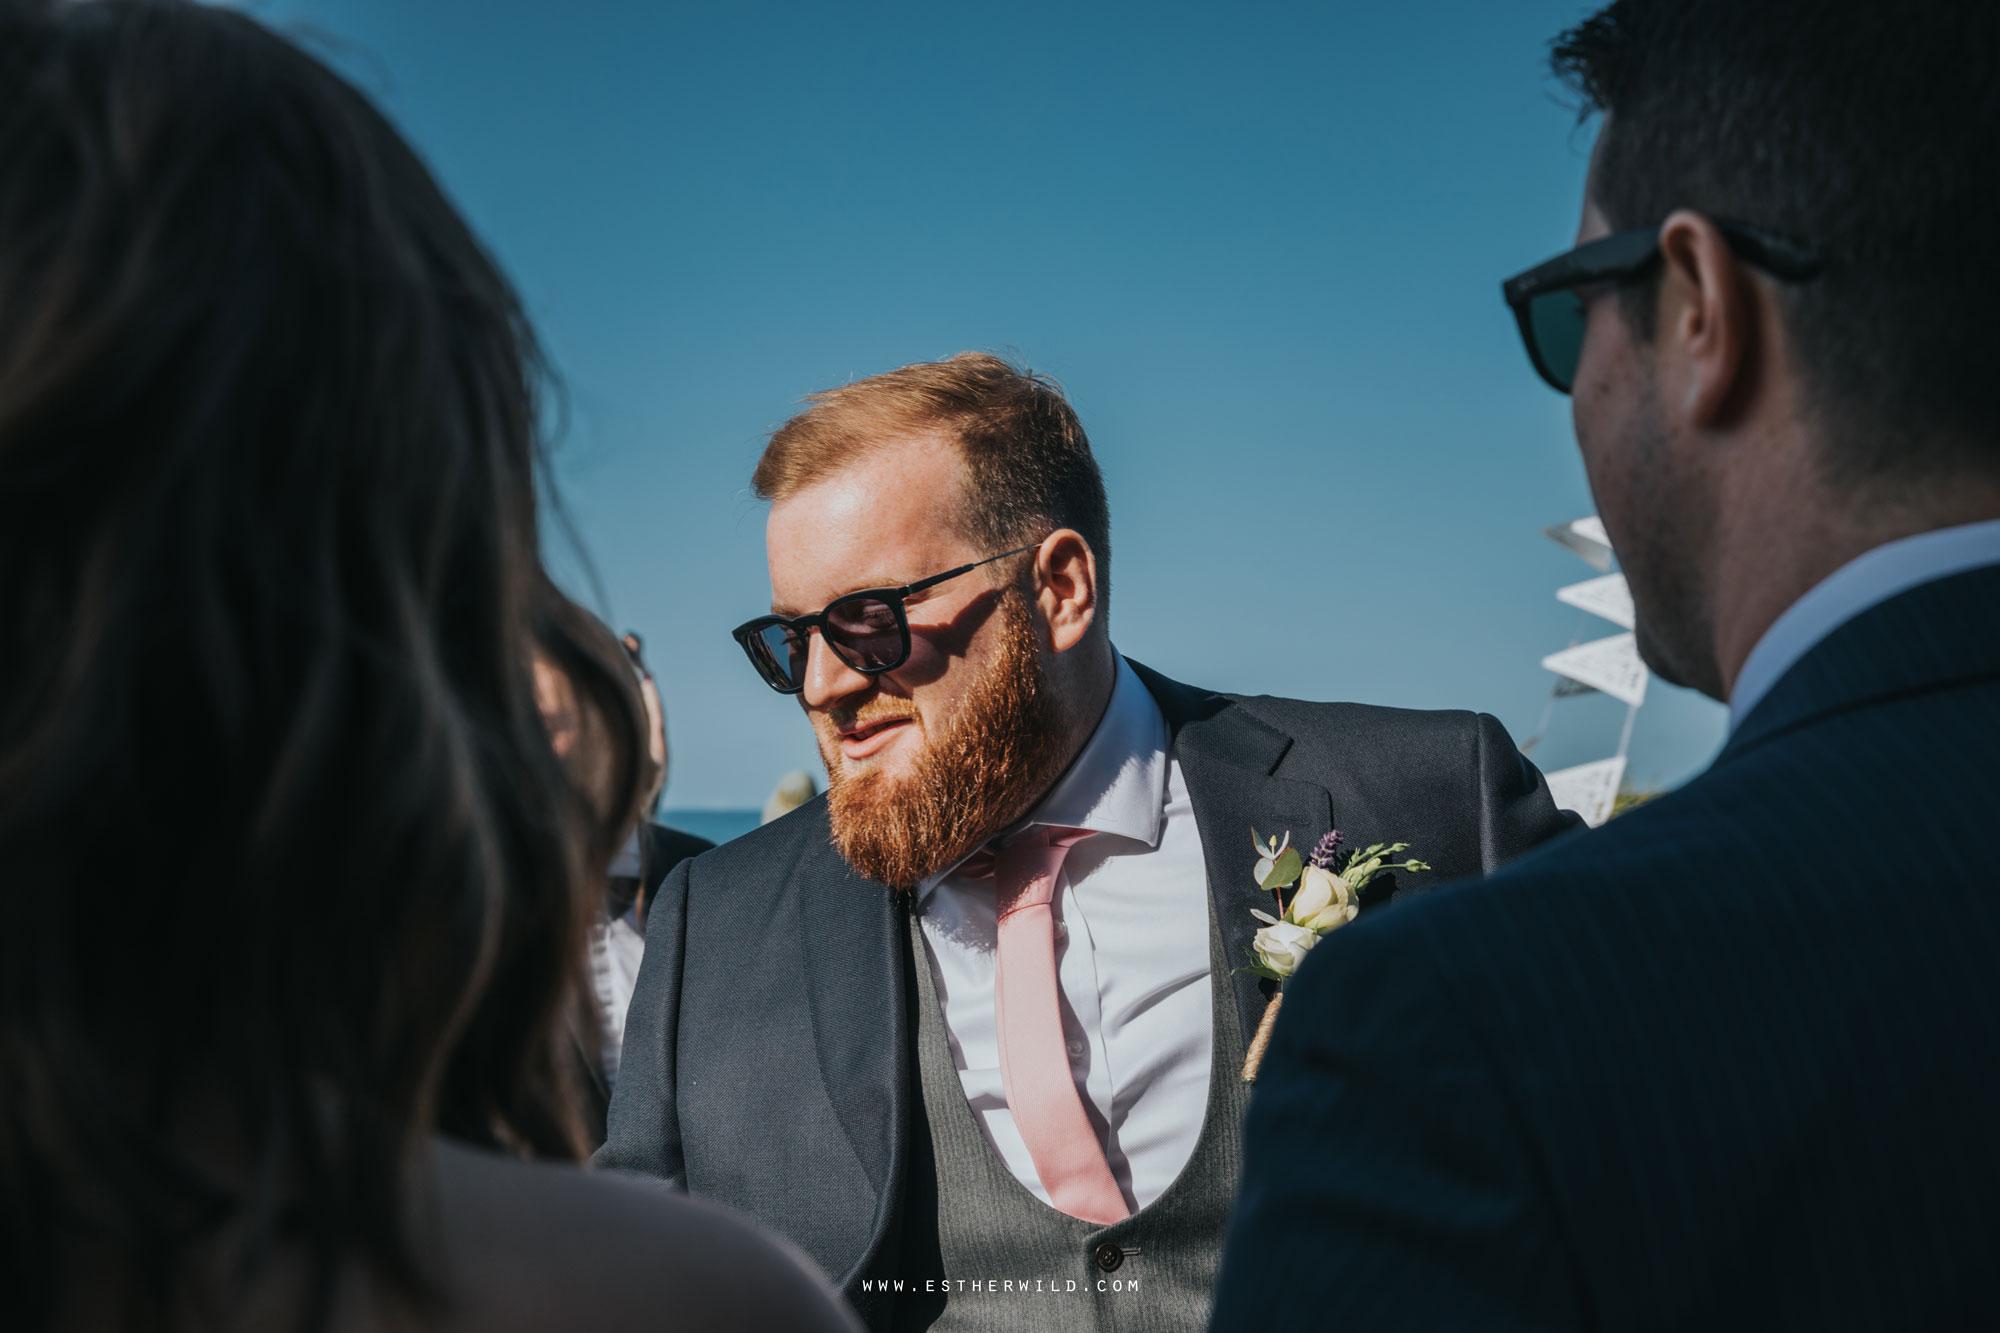 Cromer_Wedding_Beach_Outdoor_Ceremony_Norfolk_North_Lodge_Registry_Office_Rocket_House_Cafe_Cromer_Pier_IMG_3616.jpg